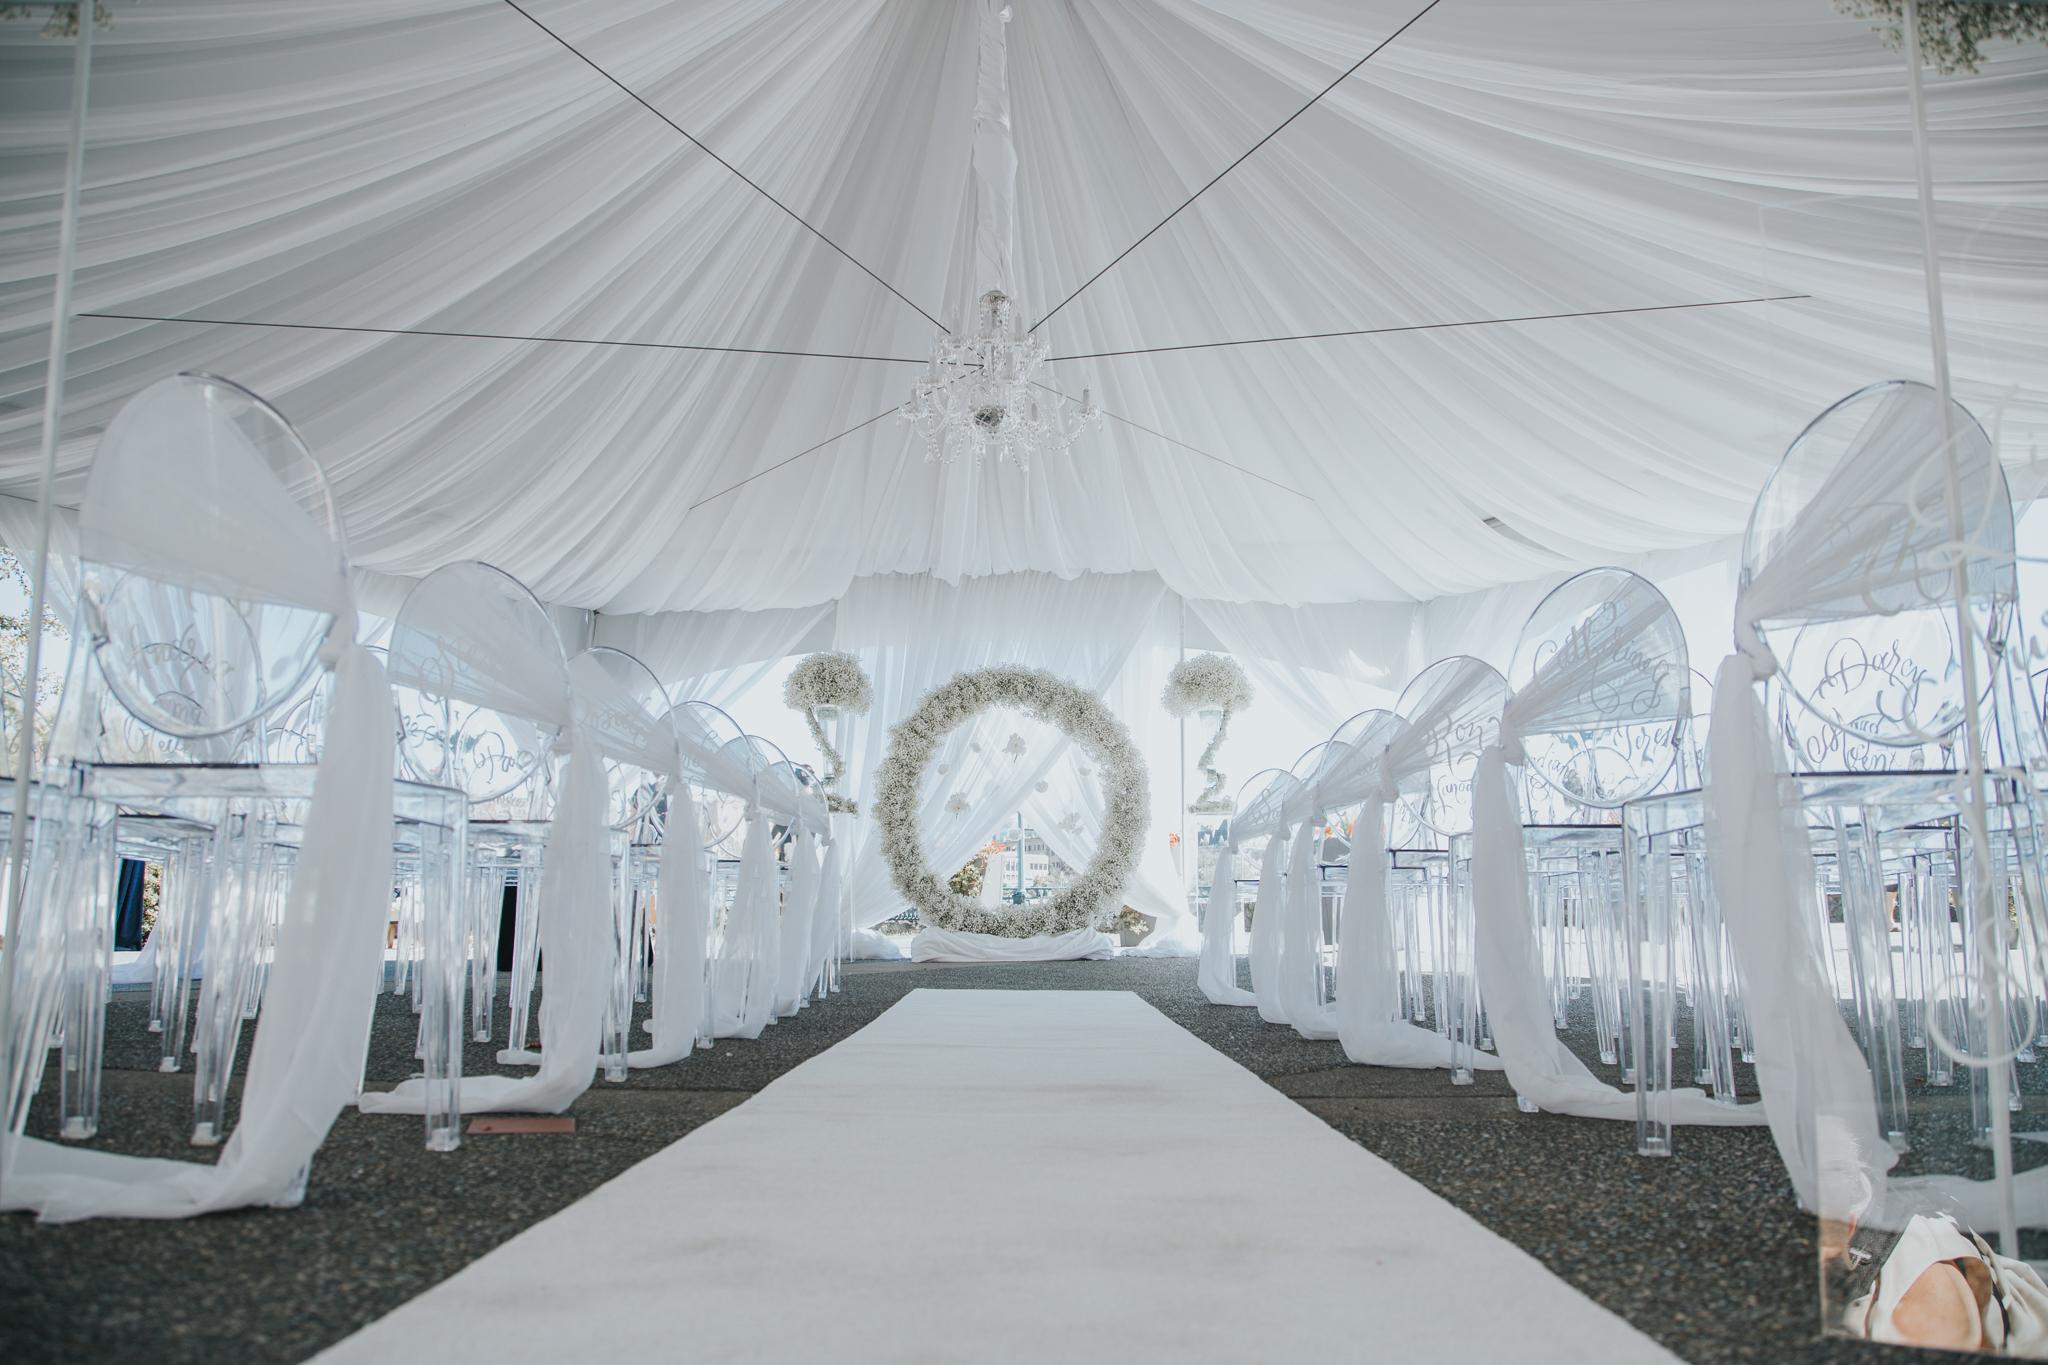 Full Tent Drape by Designer Weddings Inc in Victoria BC